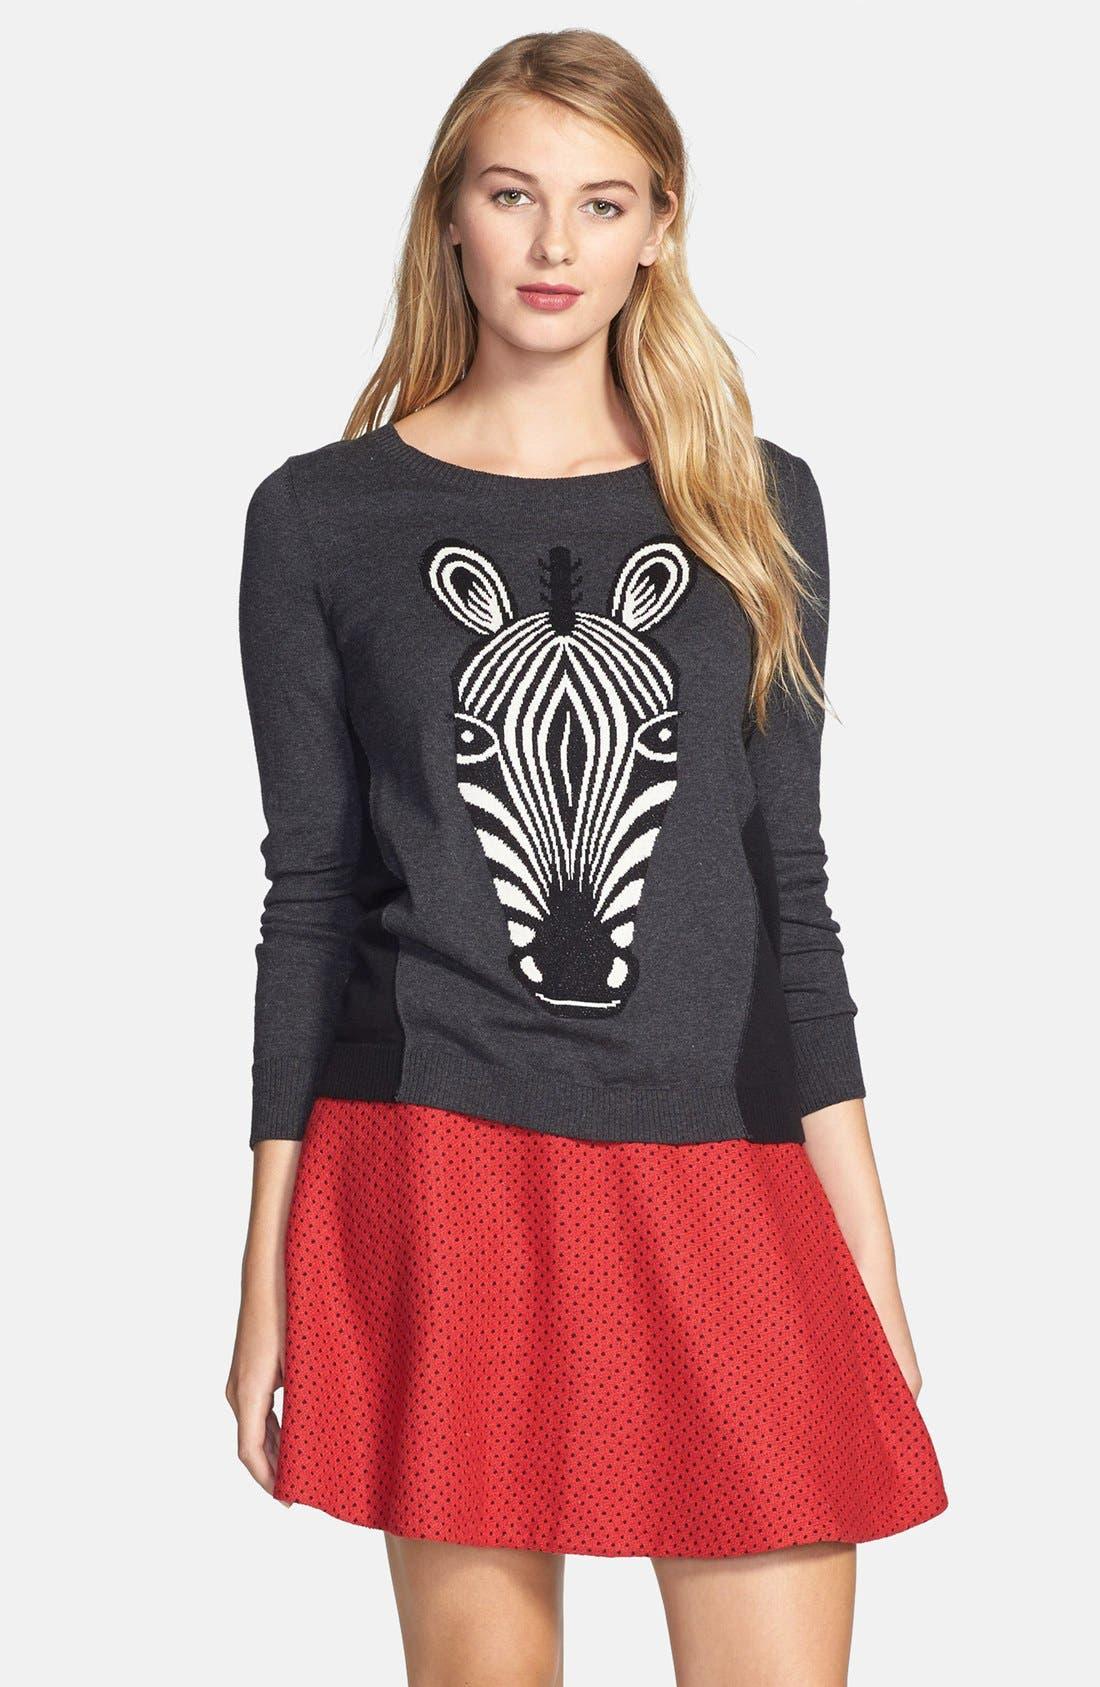 Main Image - kensie Zebra Intarsia Sweater